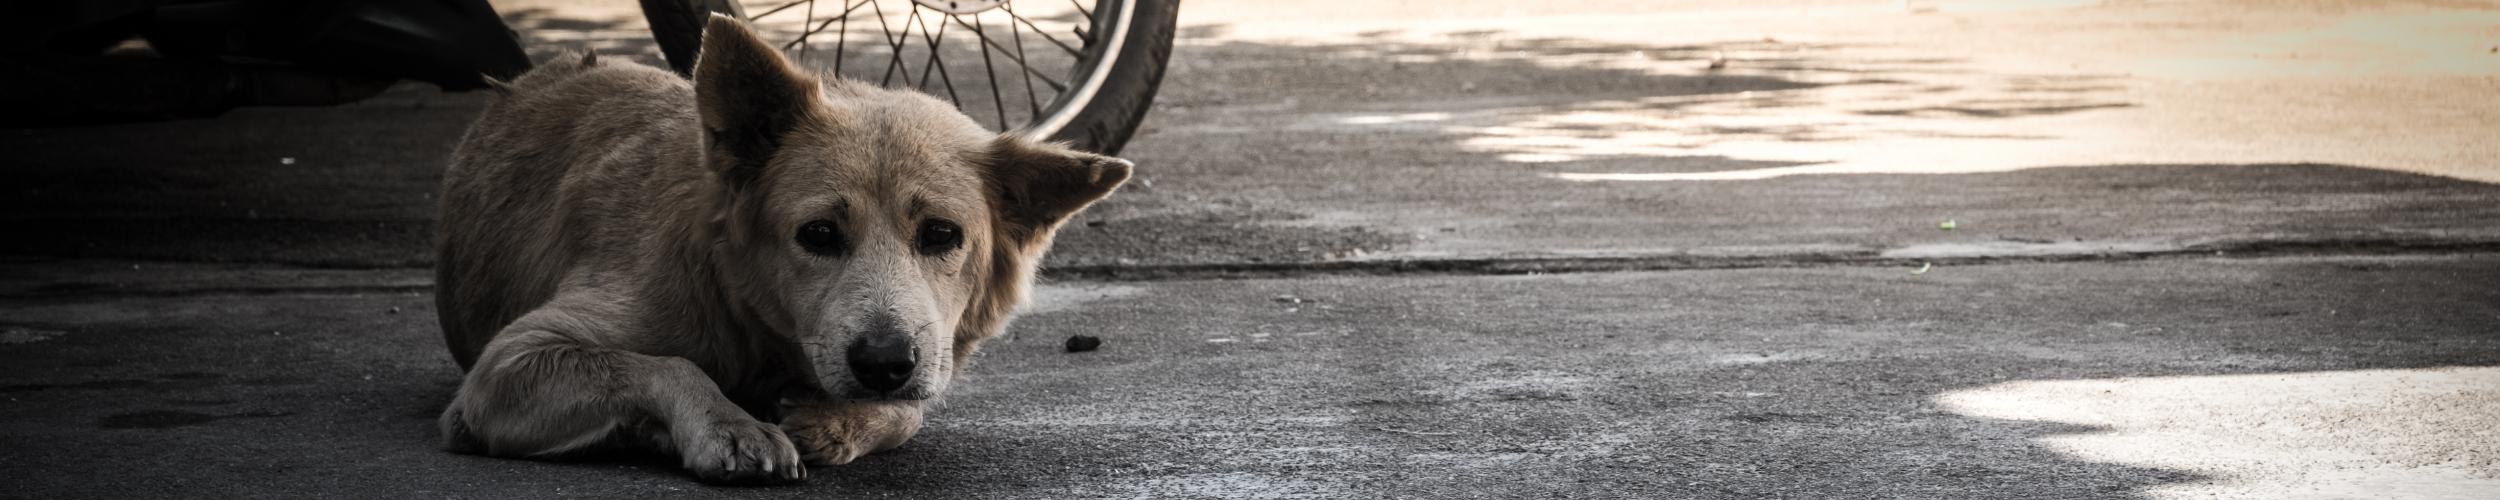 Zwerf- of verloren dieren